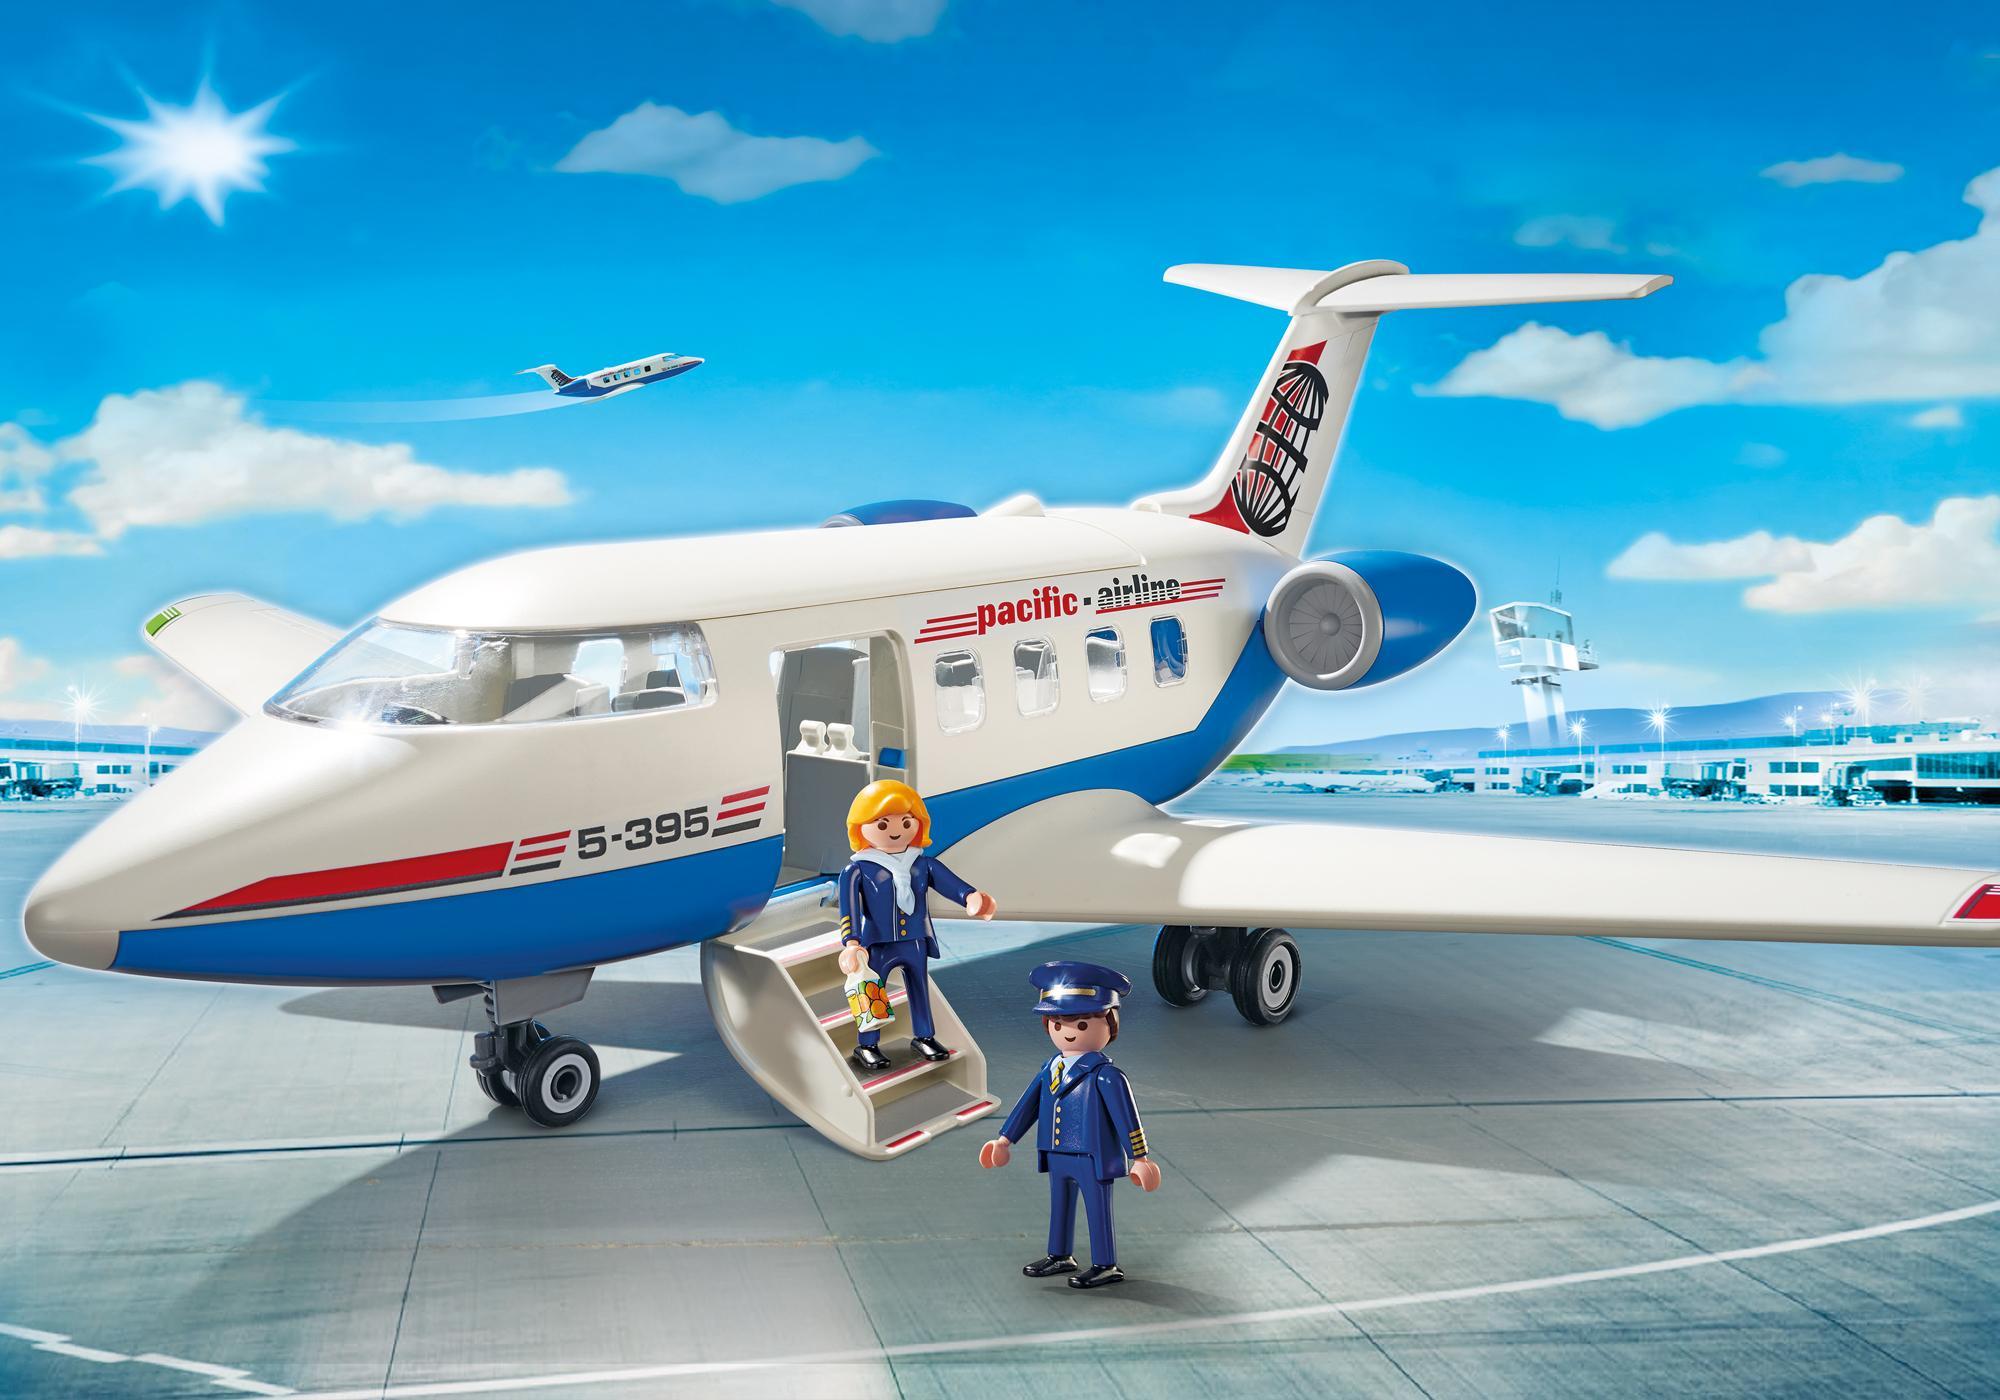 http://media.playmobil.com/i/playmobil/5395_product_detail/Passenger Plane